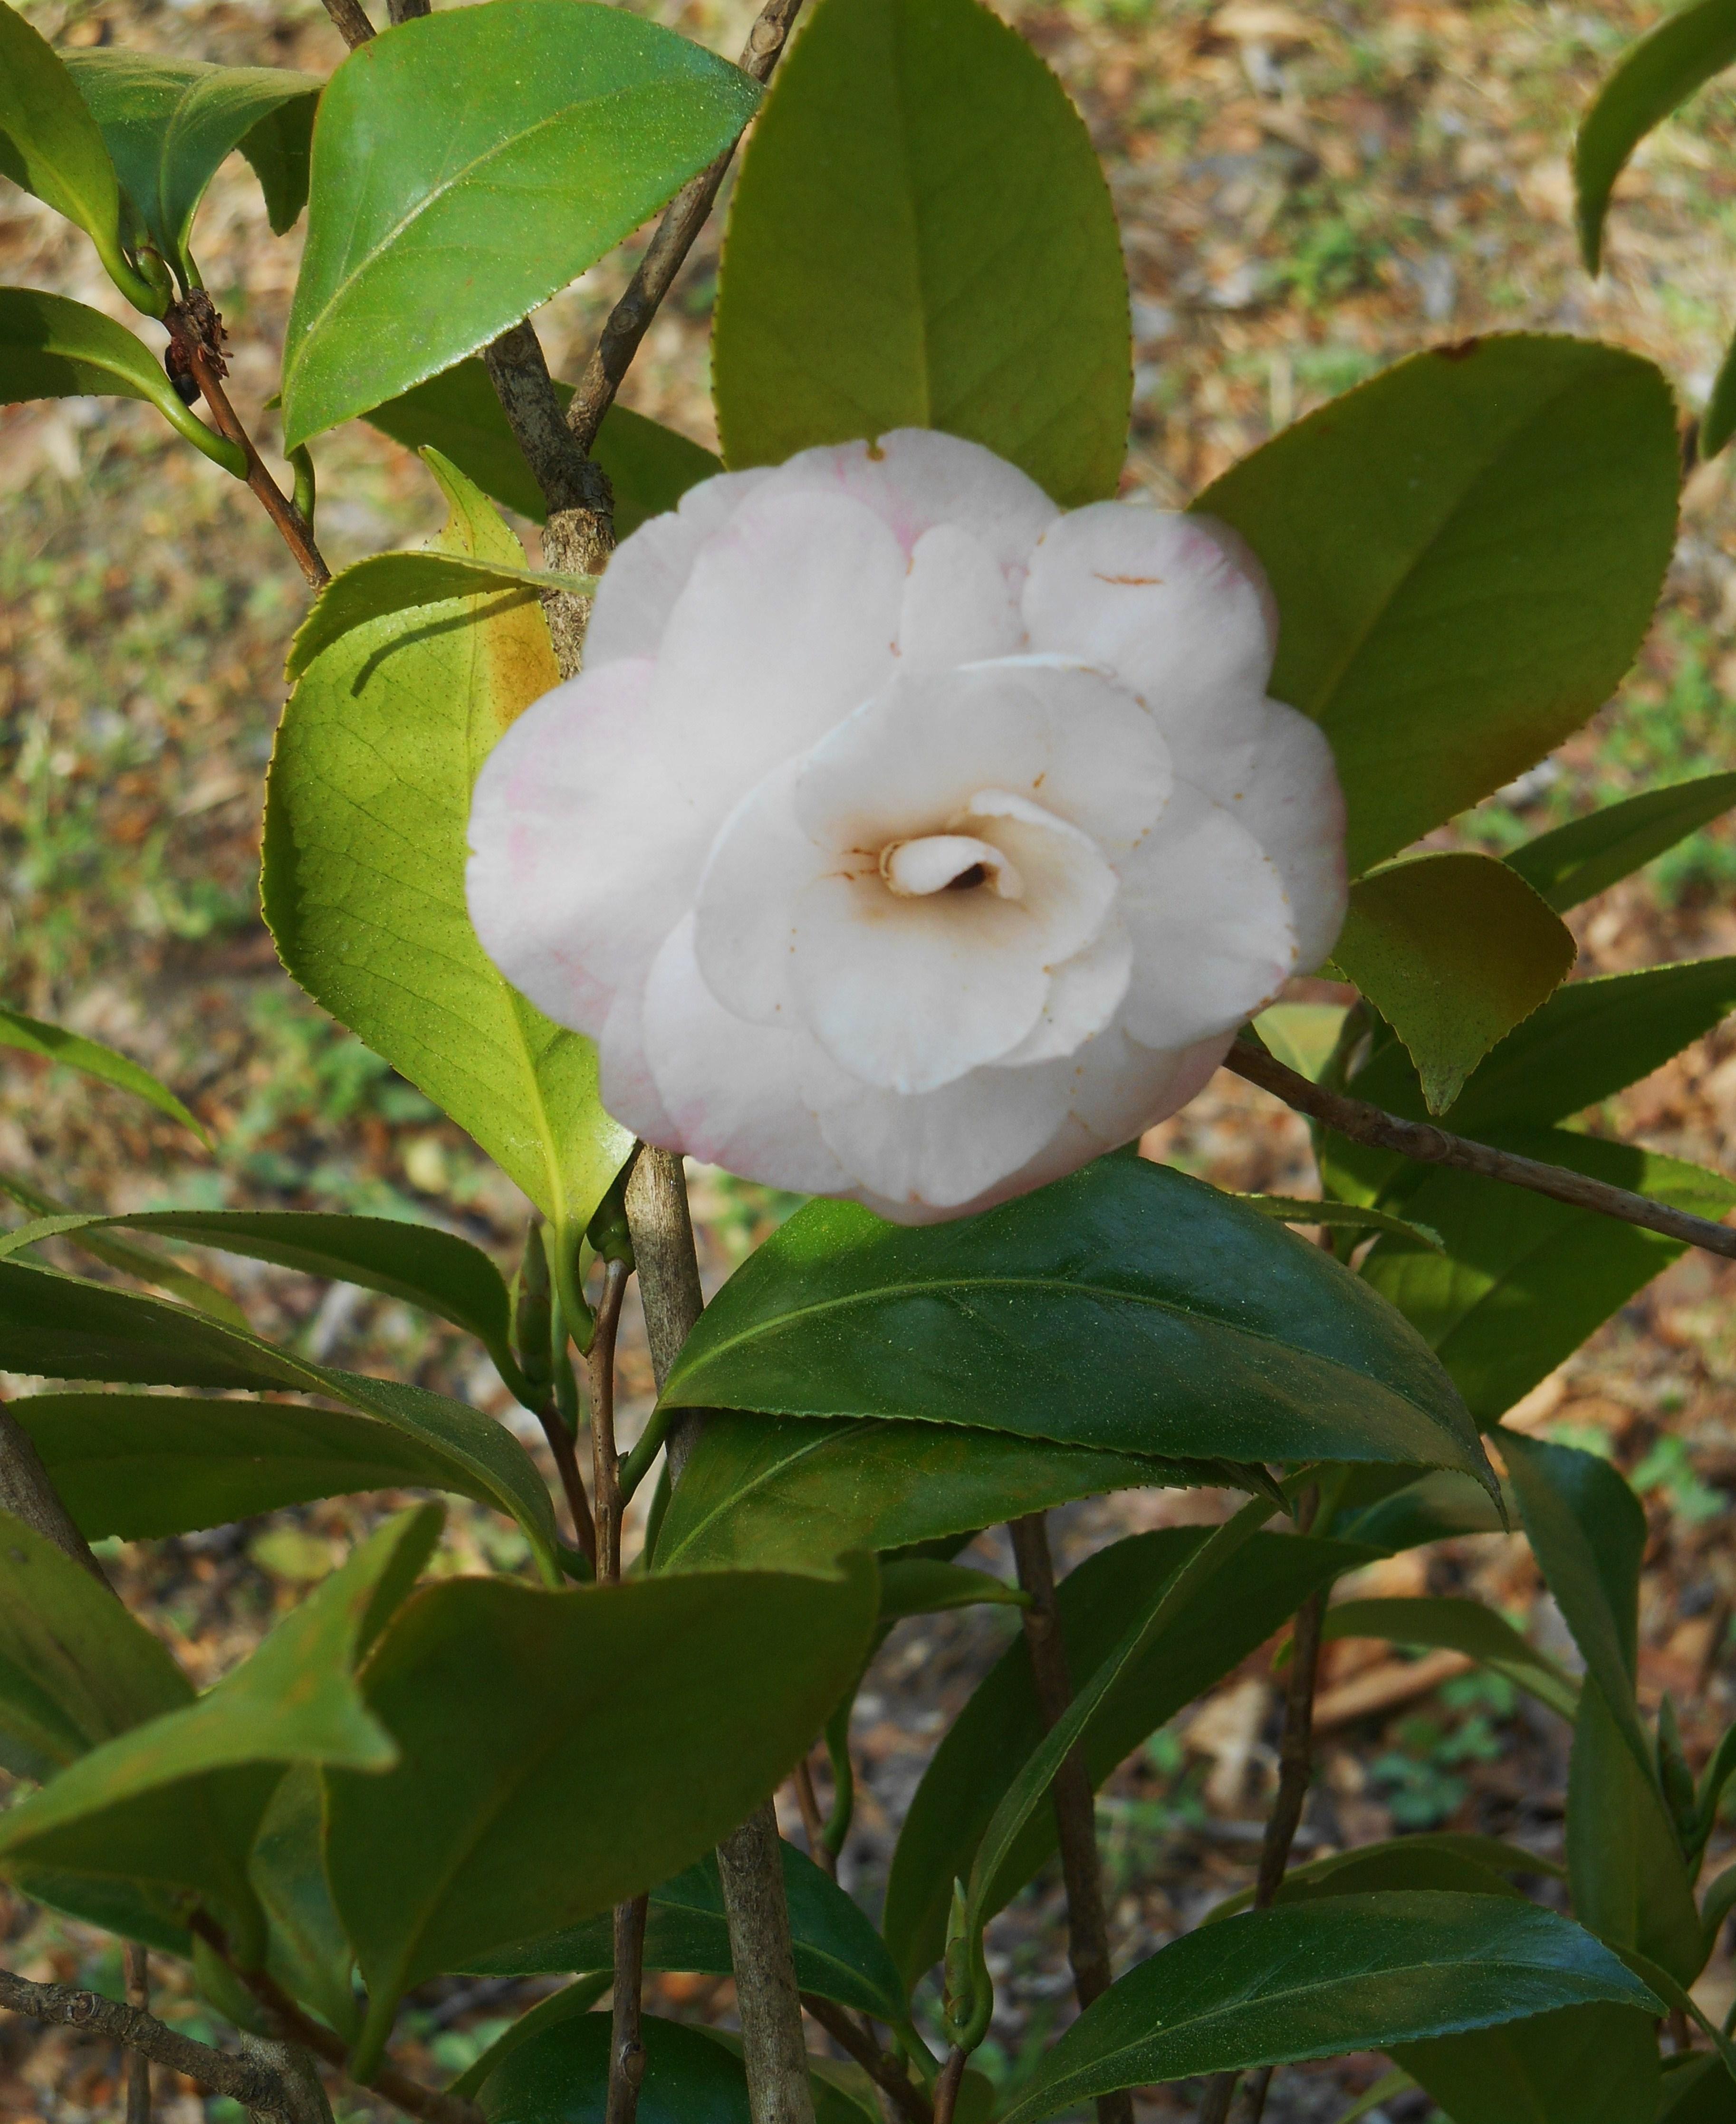 Today April Flowers: April 12, 2015 Flowers 064